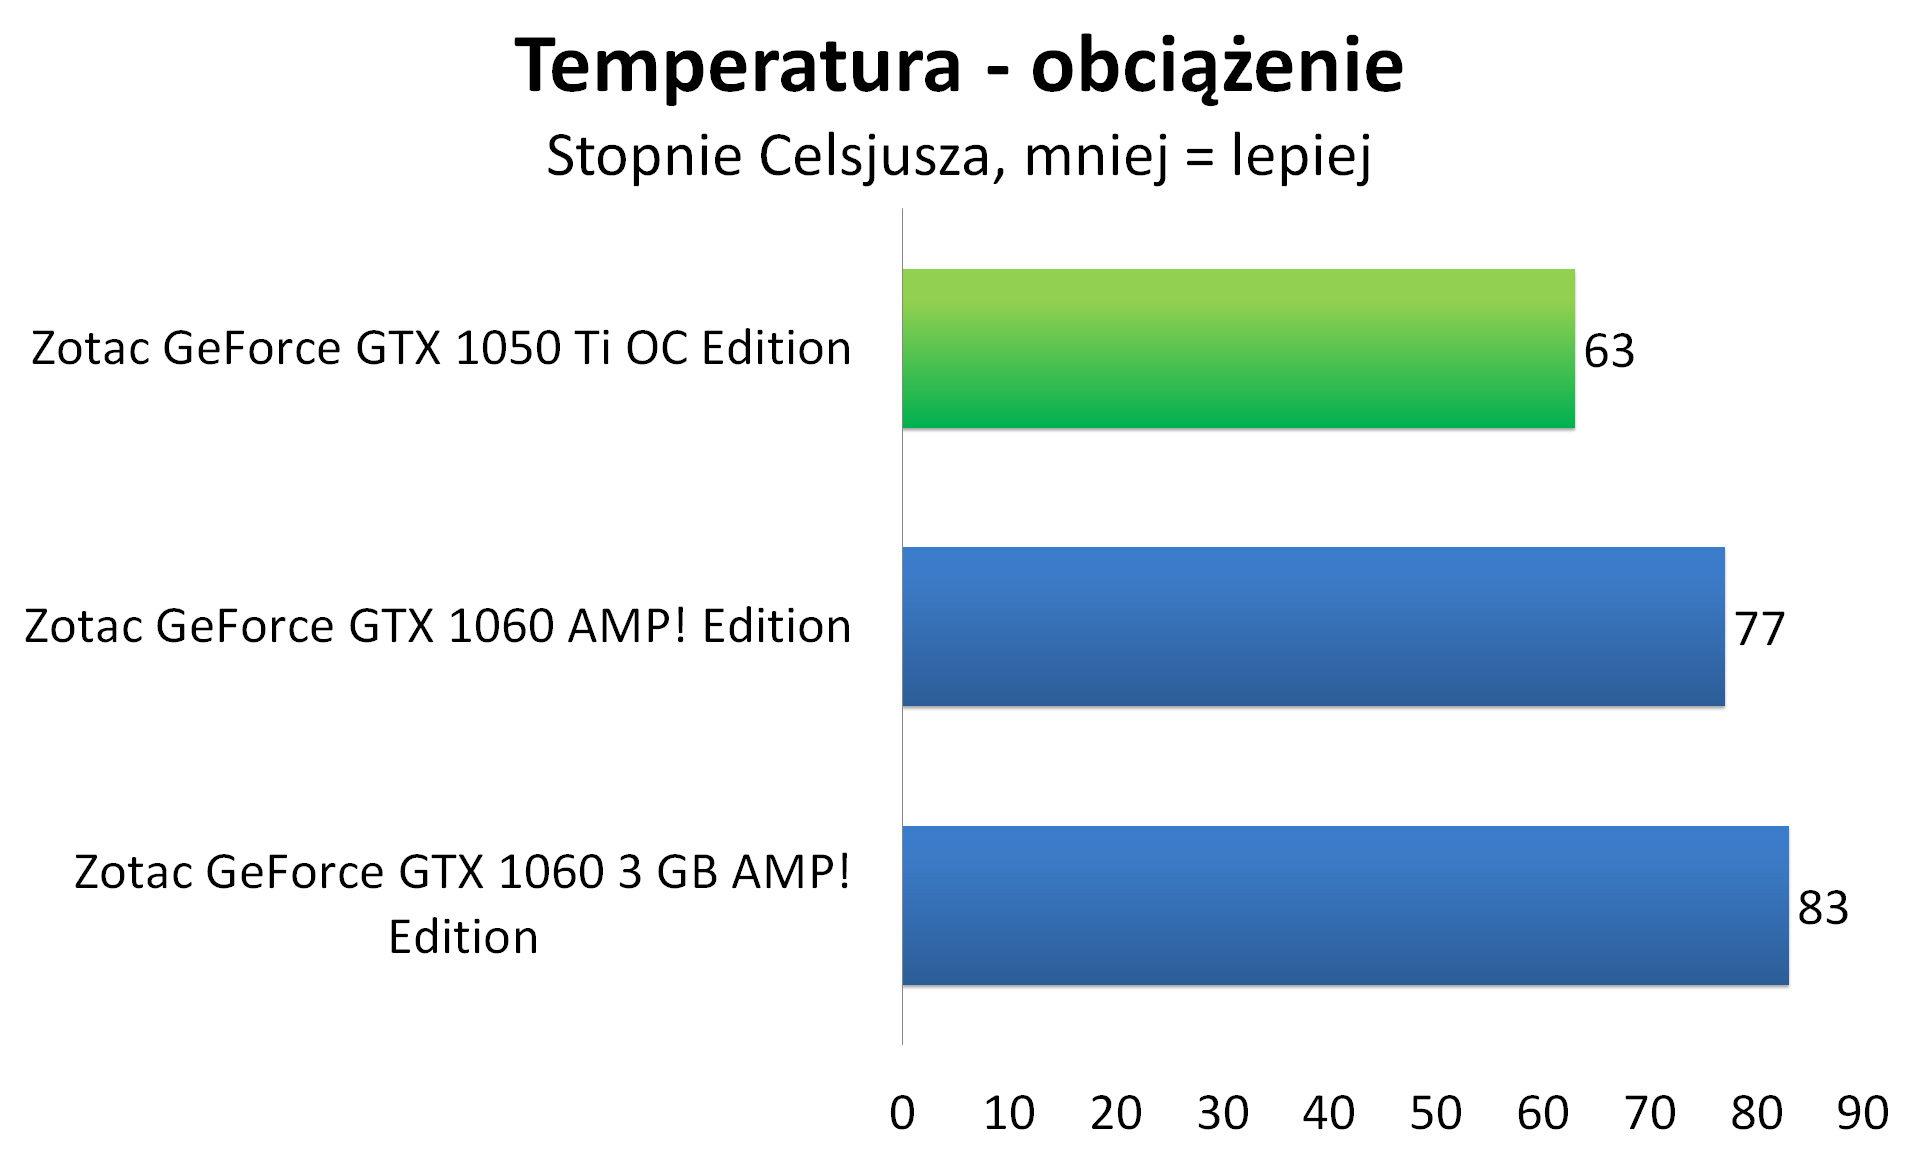 Zotac GeForce GTX 1050 Ti OC Edition - Temperatura - obciążenie